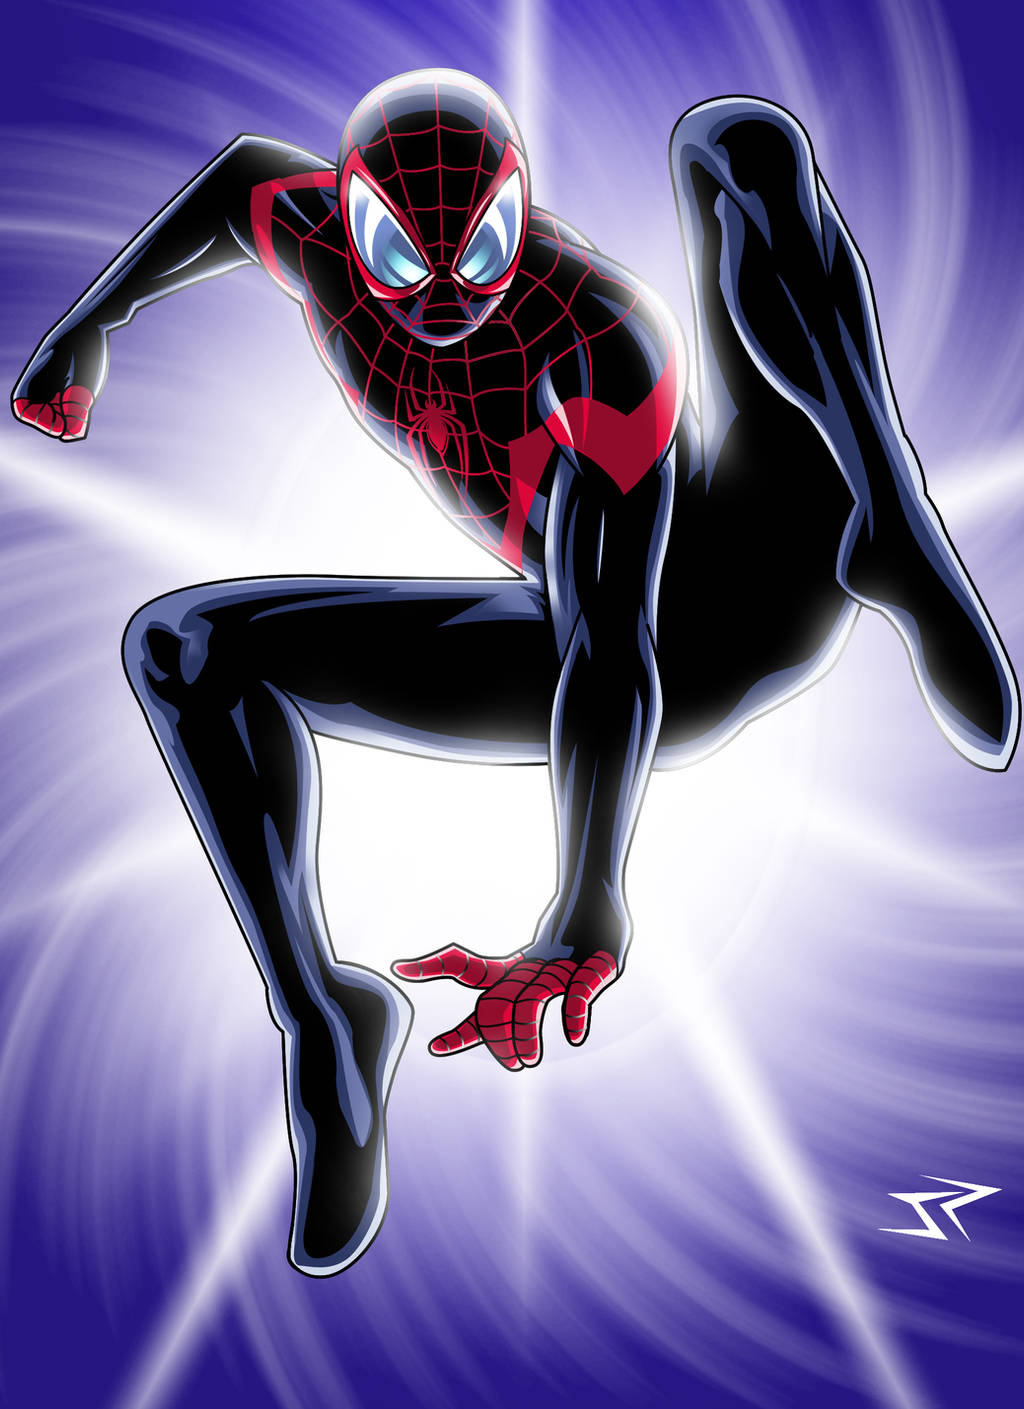 Ultimate Spiderman Miles Morales Art By Jonathanpiccini Jp On Deviantart